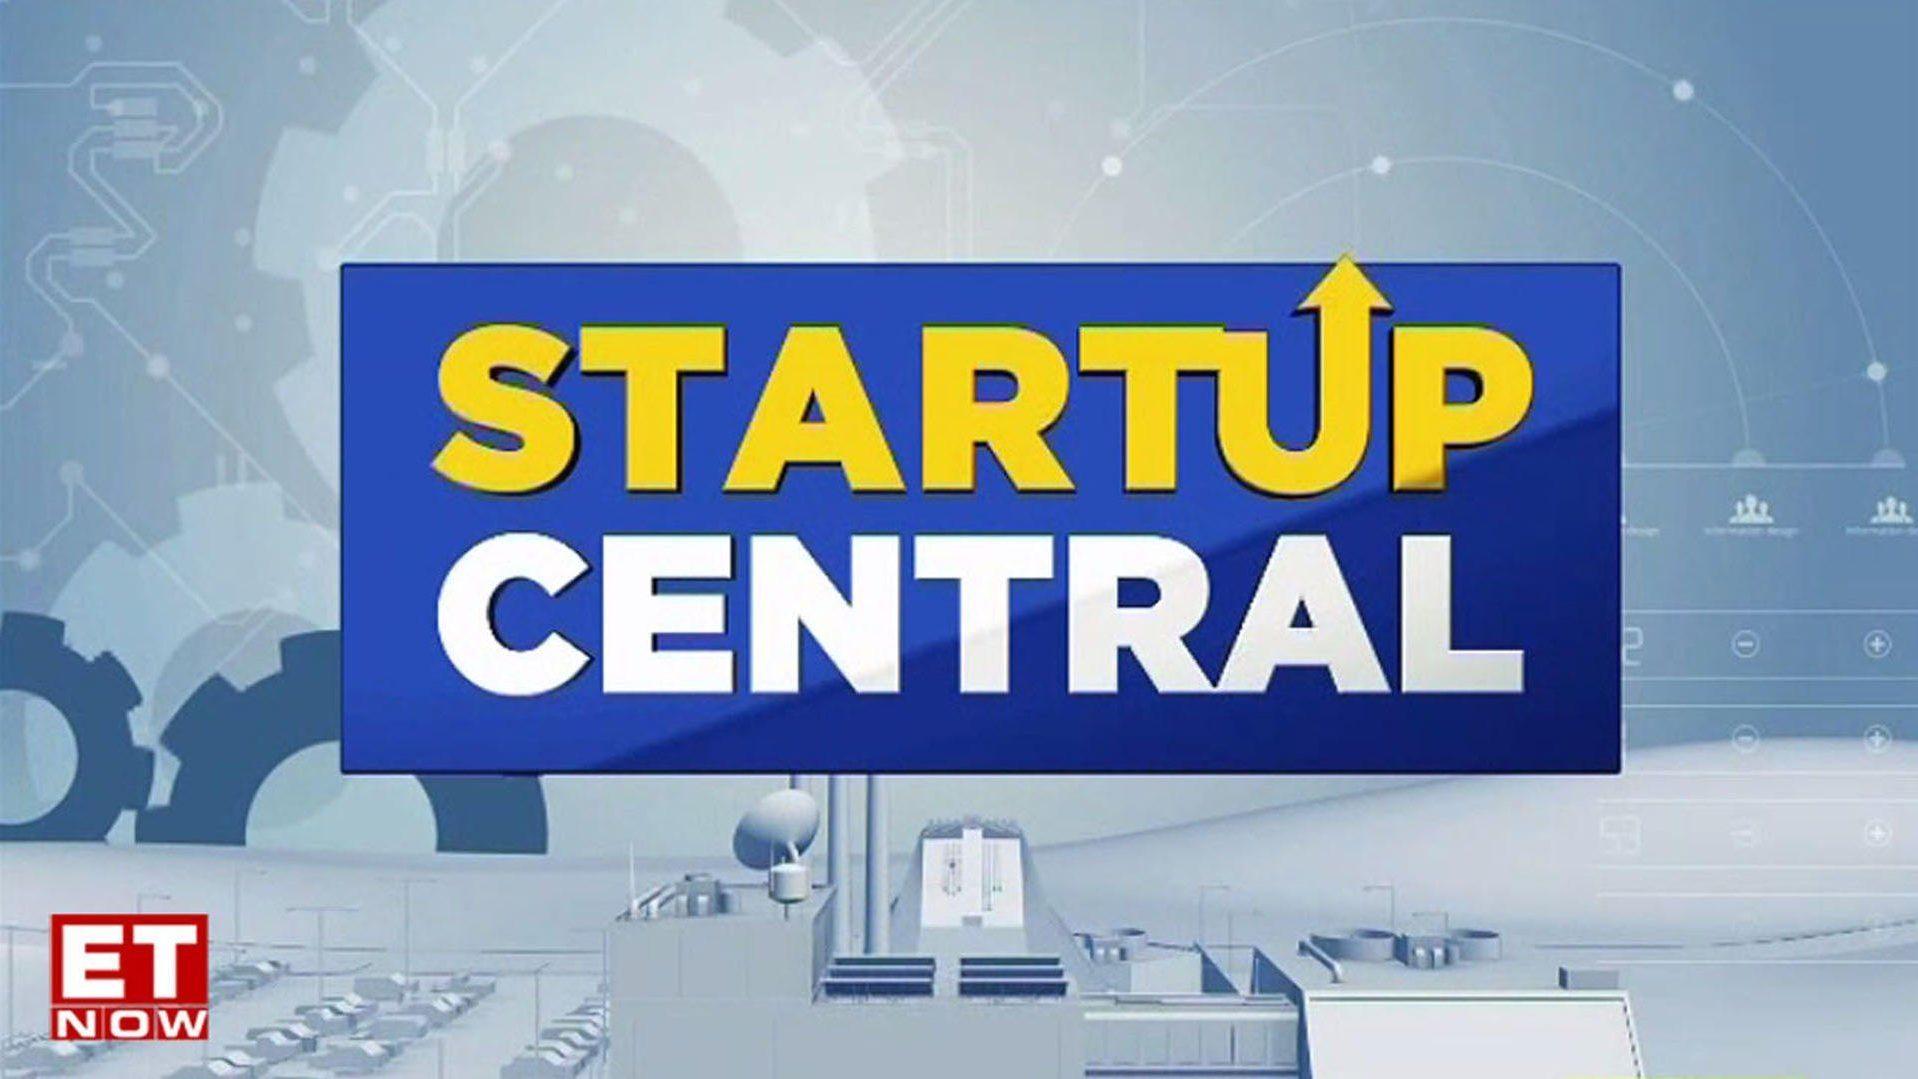 ET Now startup_central